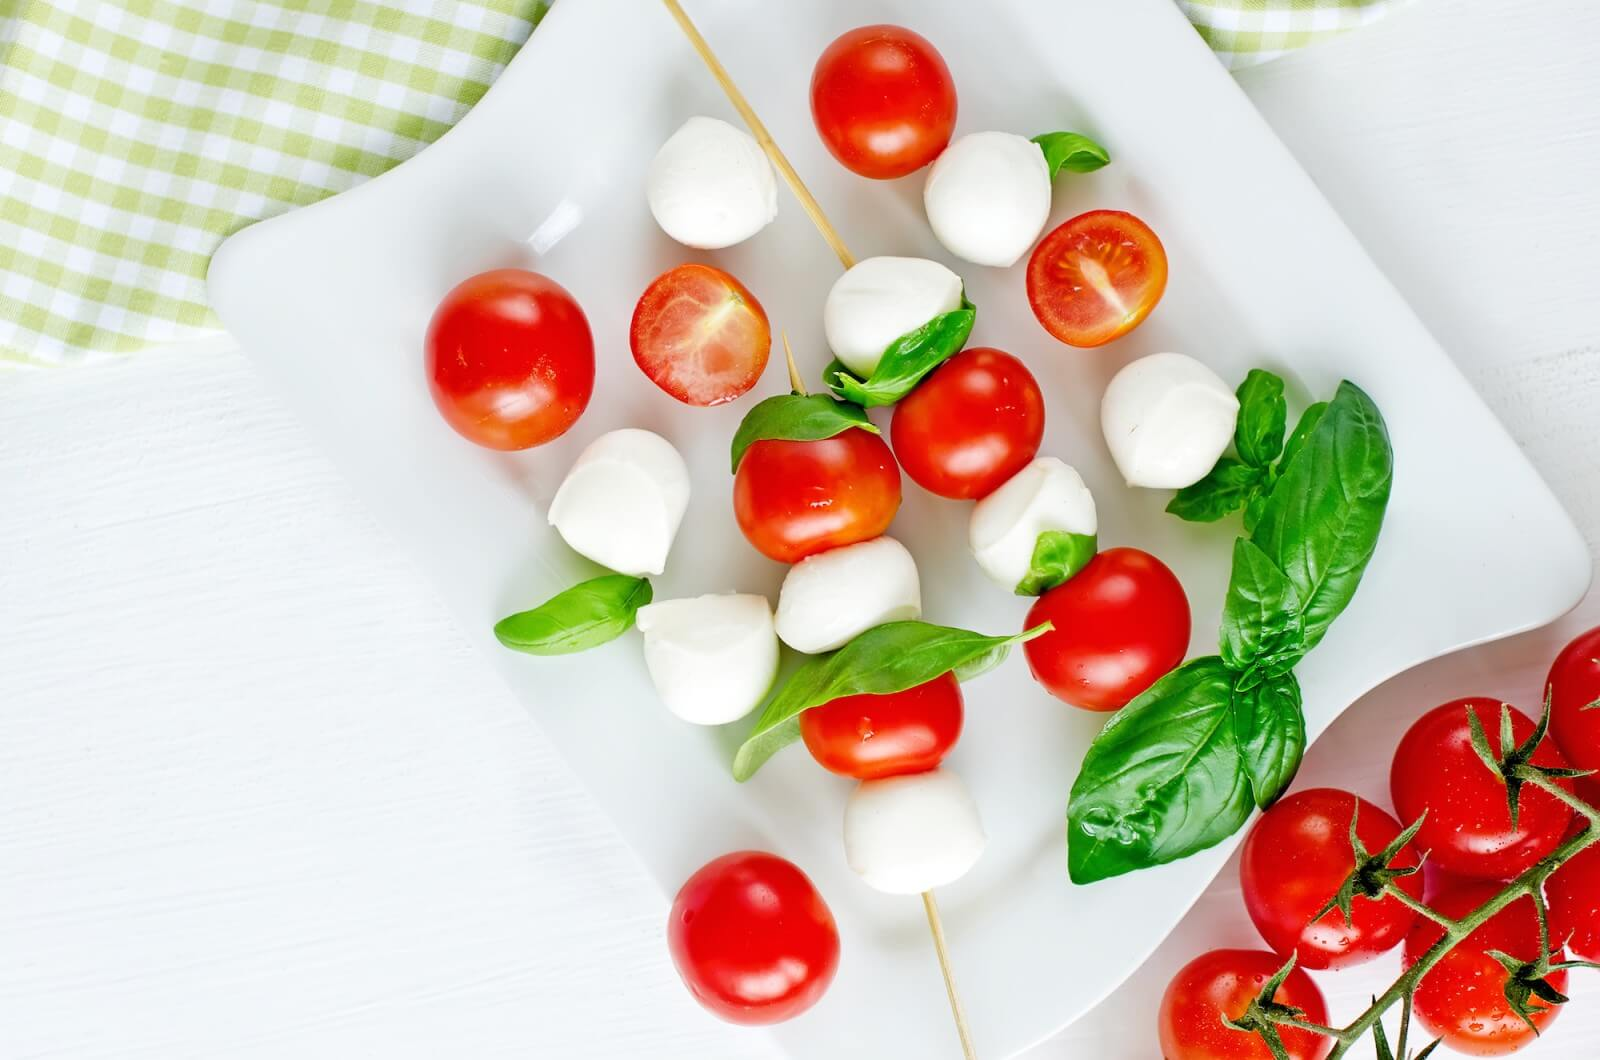 Salad with Arugula & Cherry Tomatoes